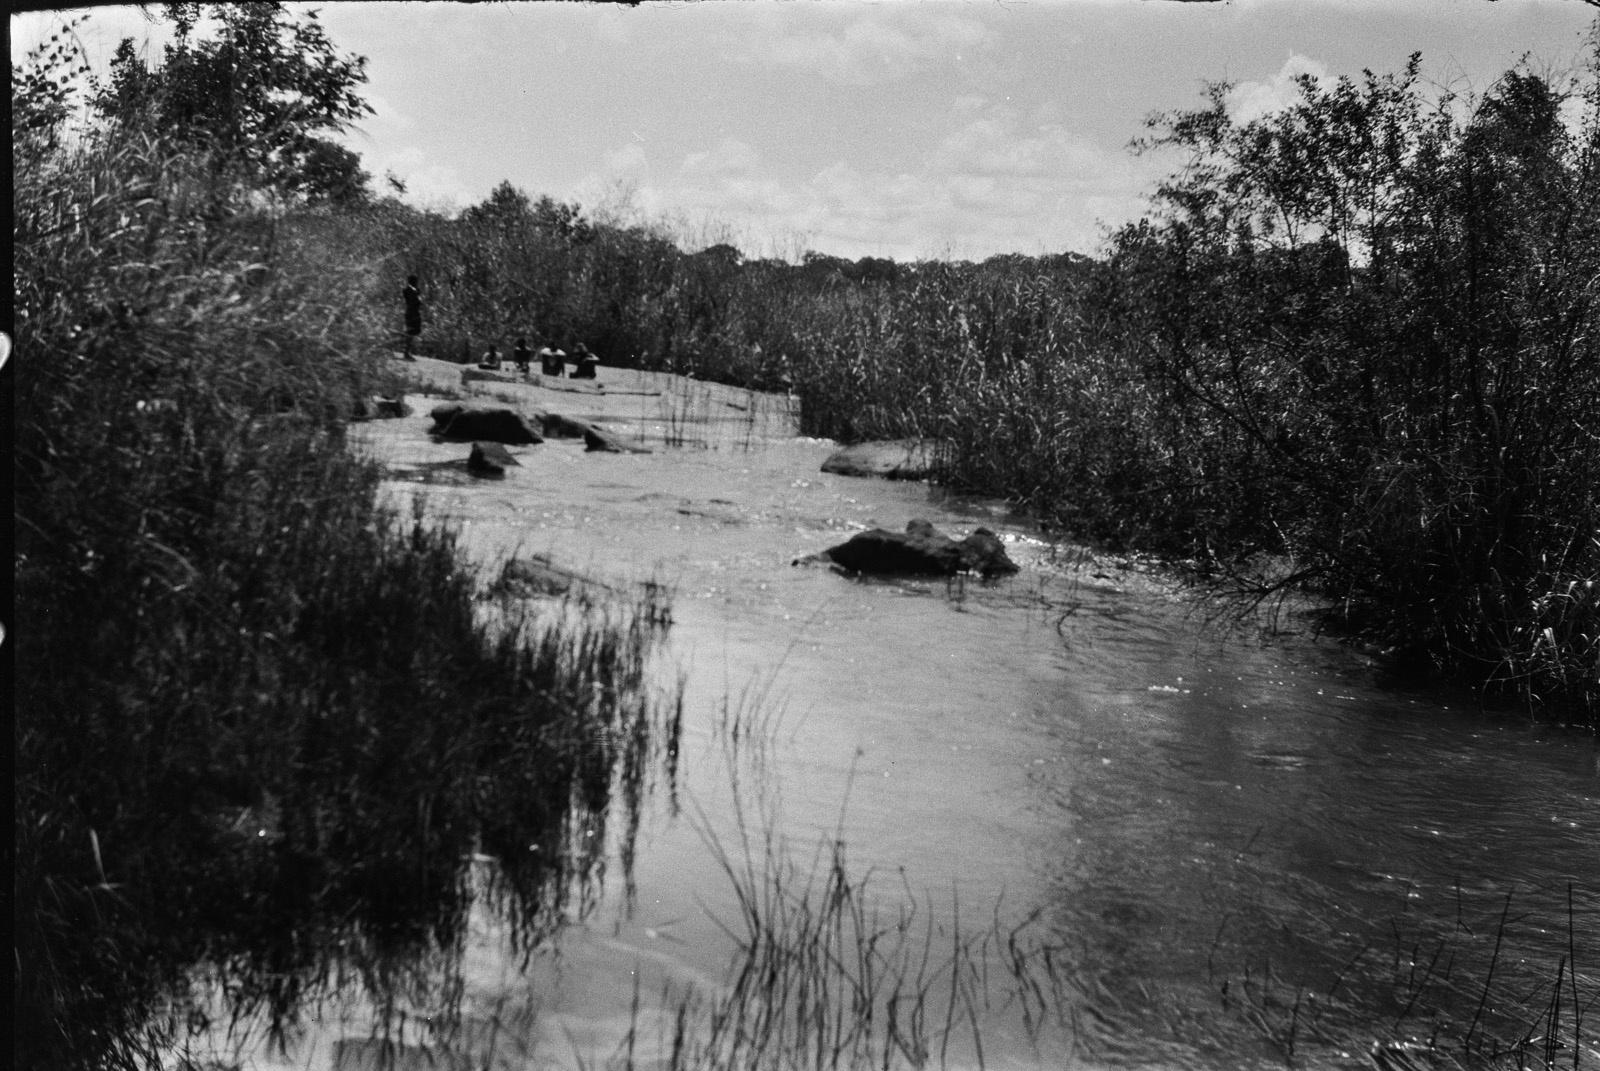 Между Капири Мпоши и рекой Лунсемфва. Река Лунчу